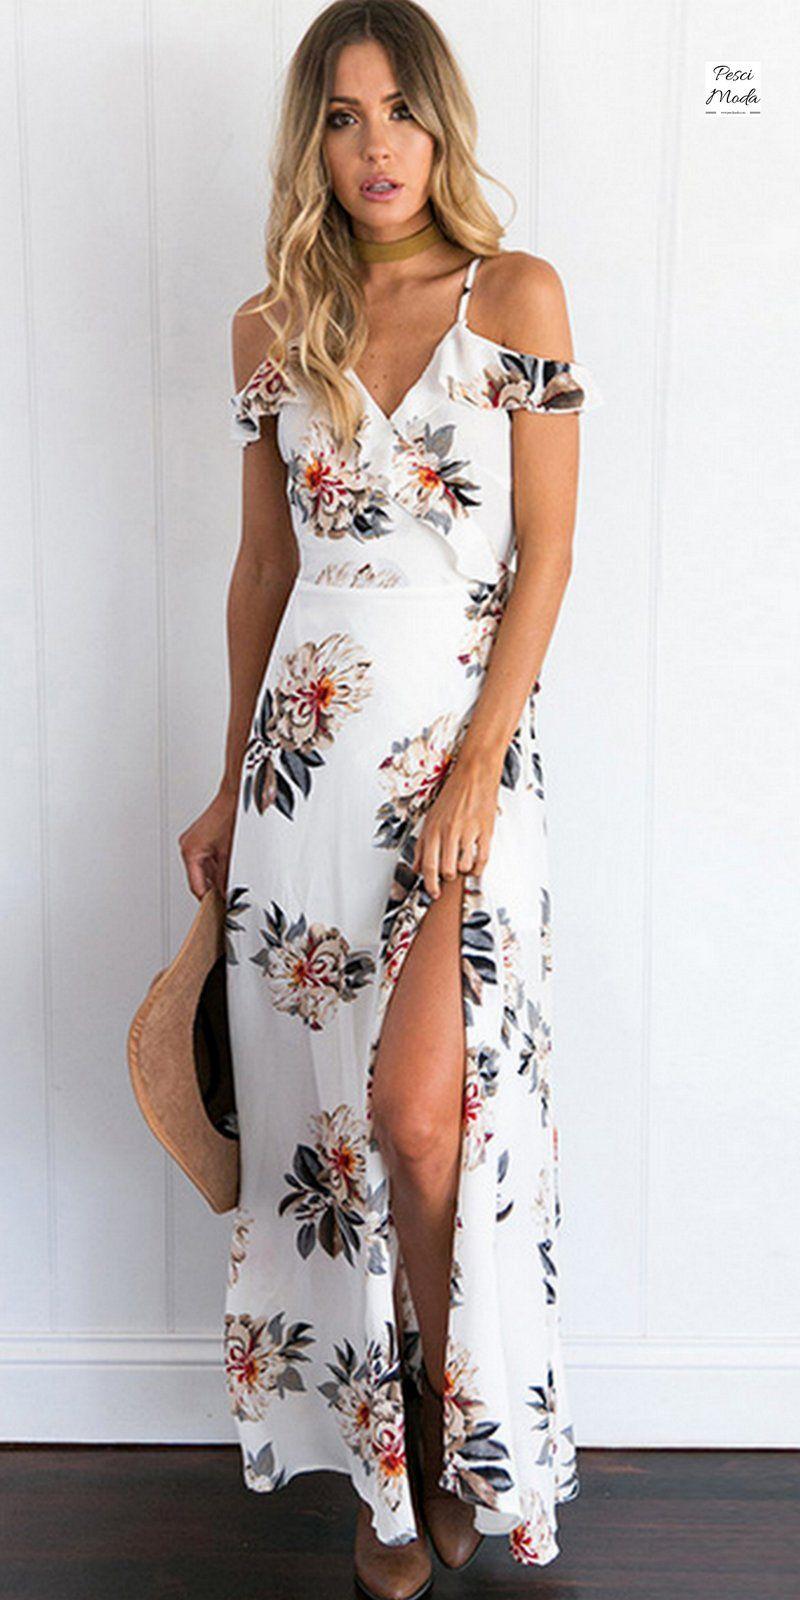 ecc649db7fc54 Elegant White Floral Chiffon Maxi Dress en 2019 | | MAXI DRESSES ...